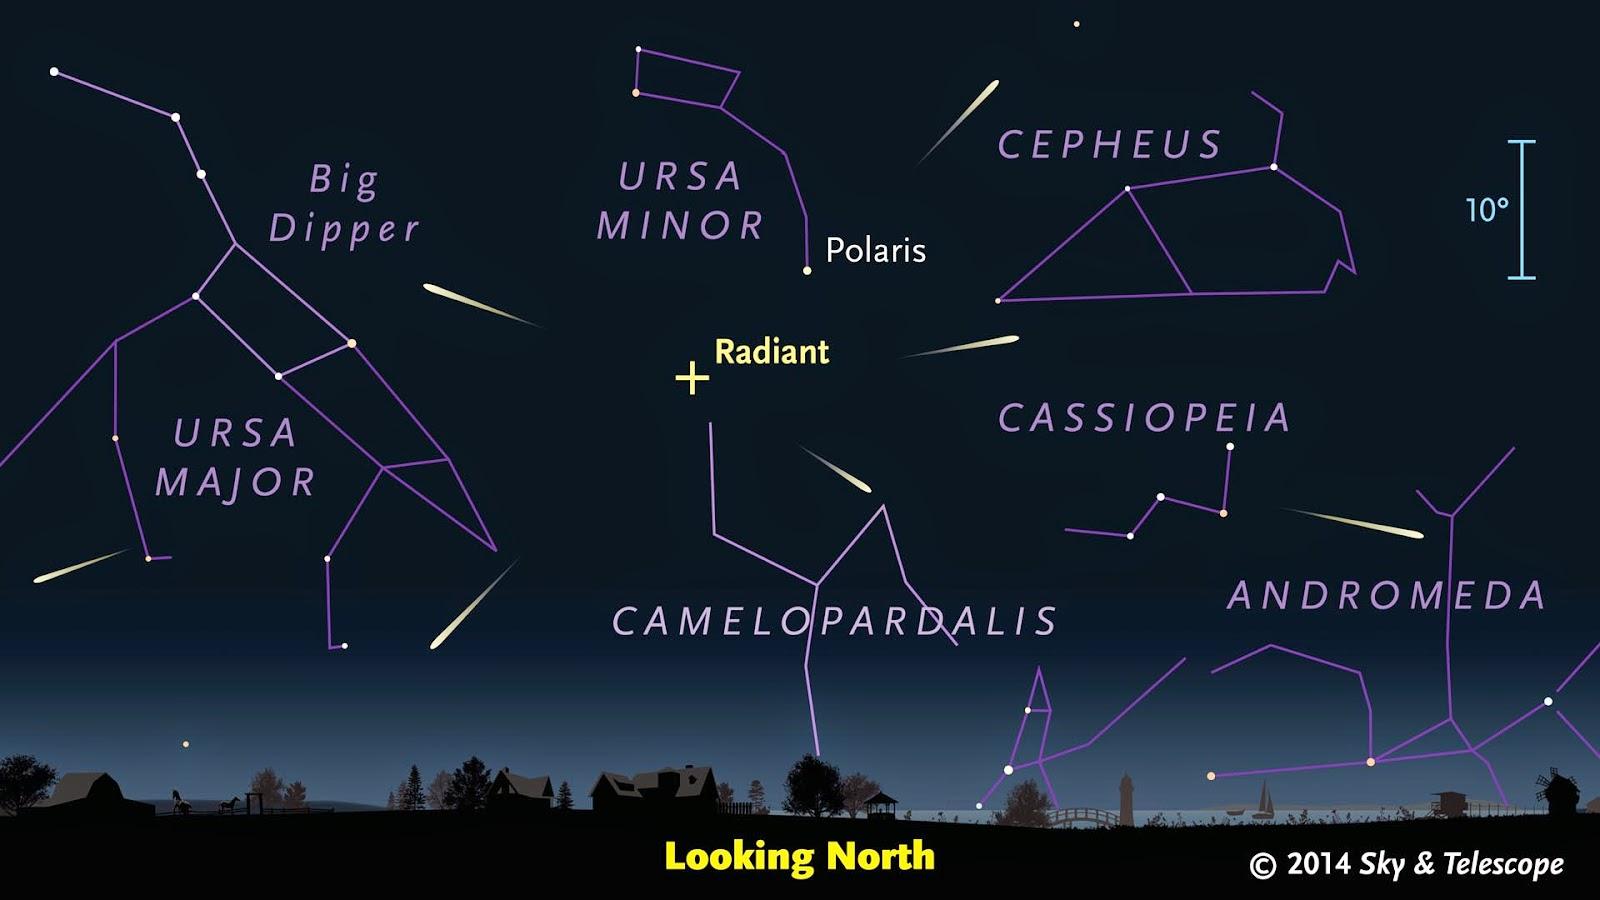 http://www.skyandtelescope.com/astronomy-news/observing-news/mays-surprise-meteor-shower/